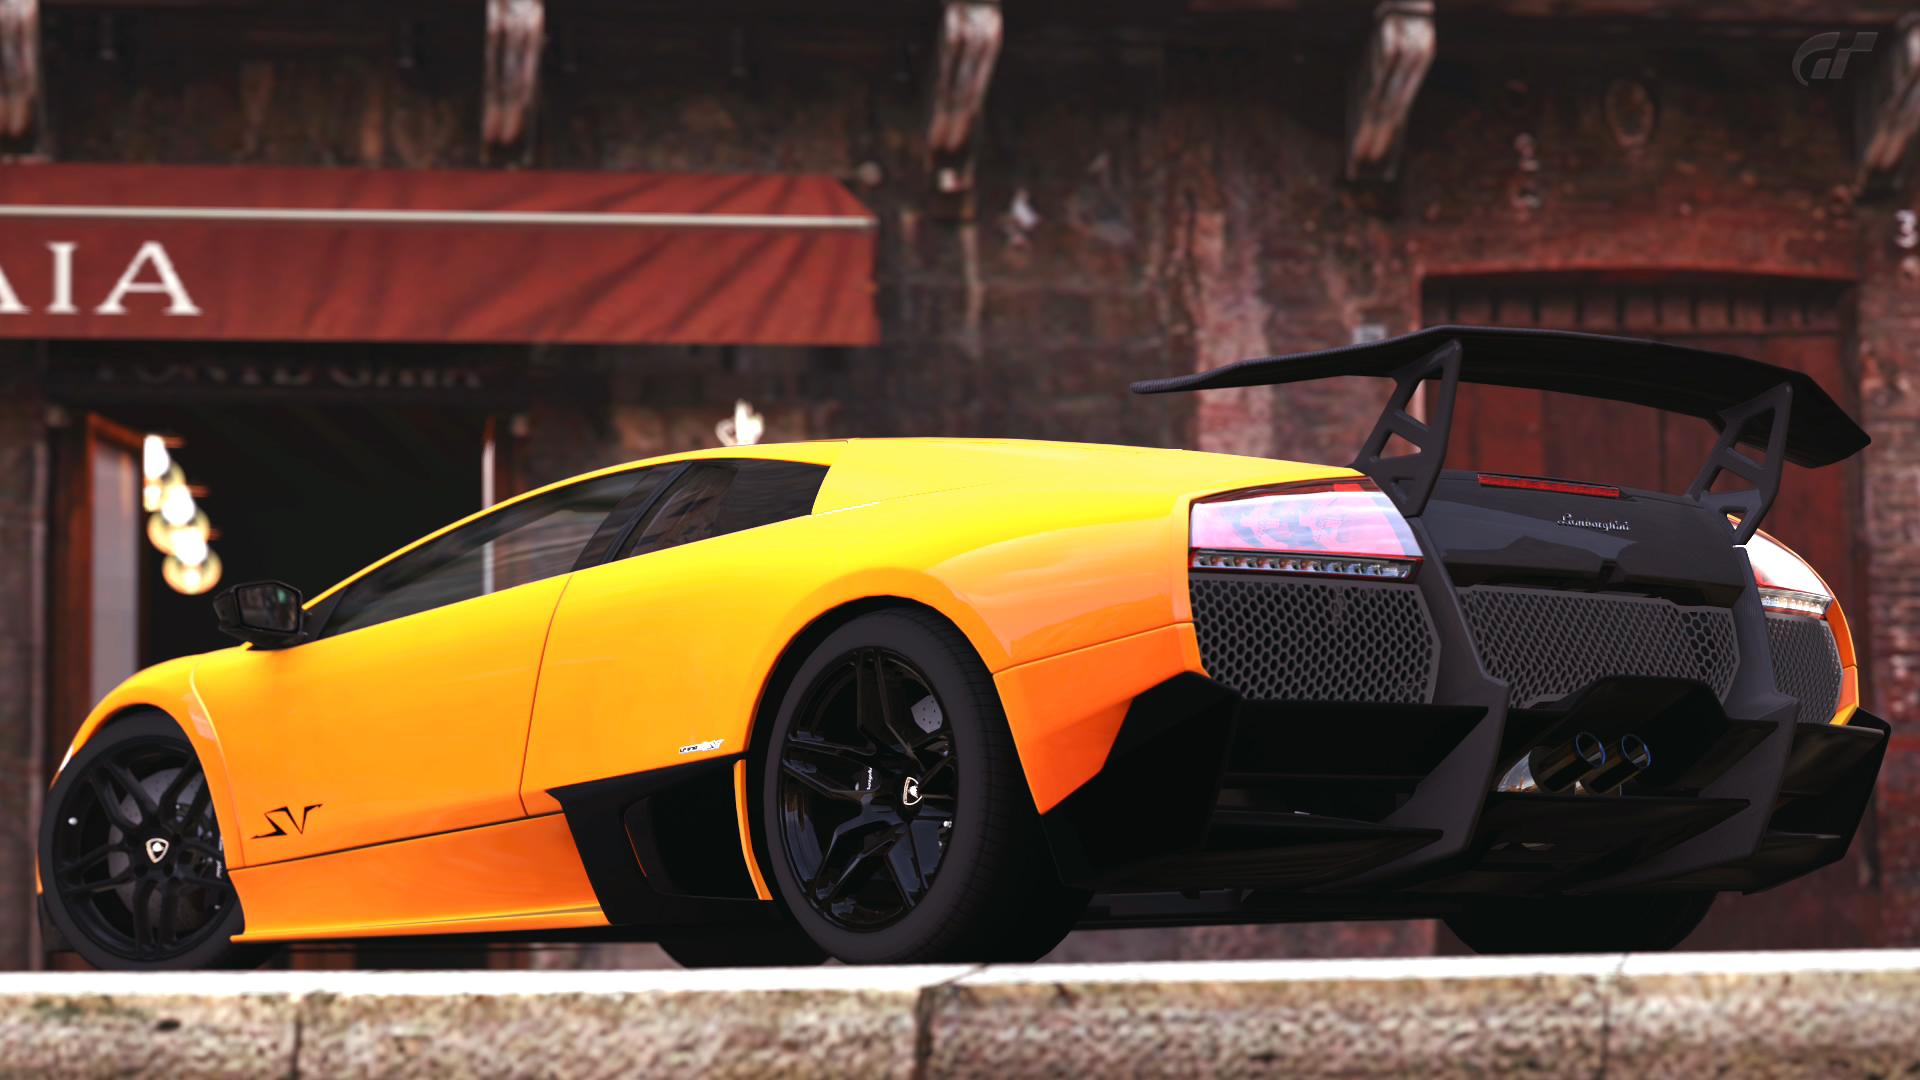 Lamborghini Murcielago LP SV Wallpapers HD Wallpapers